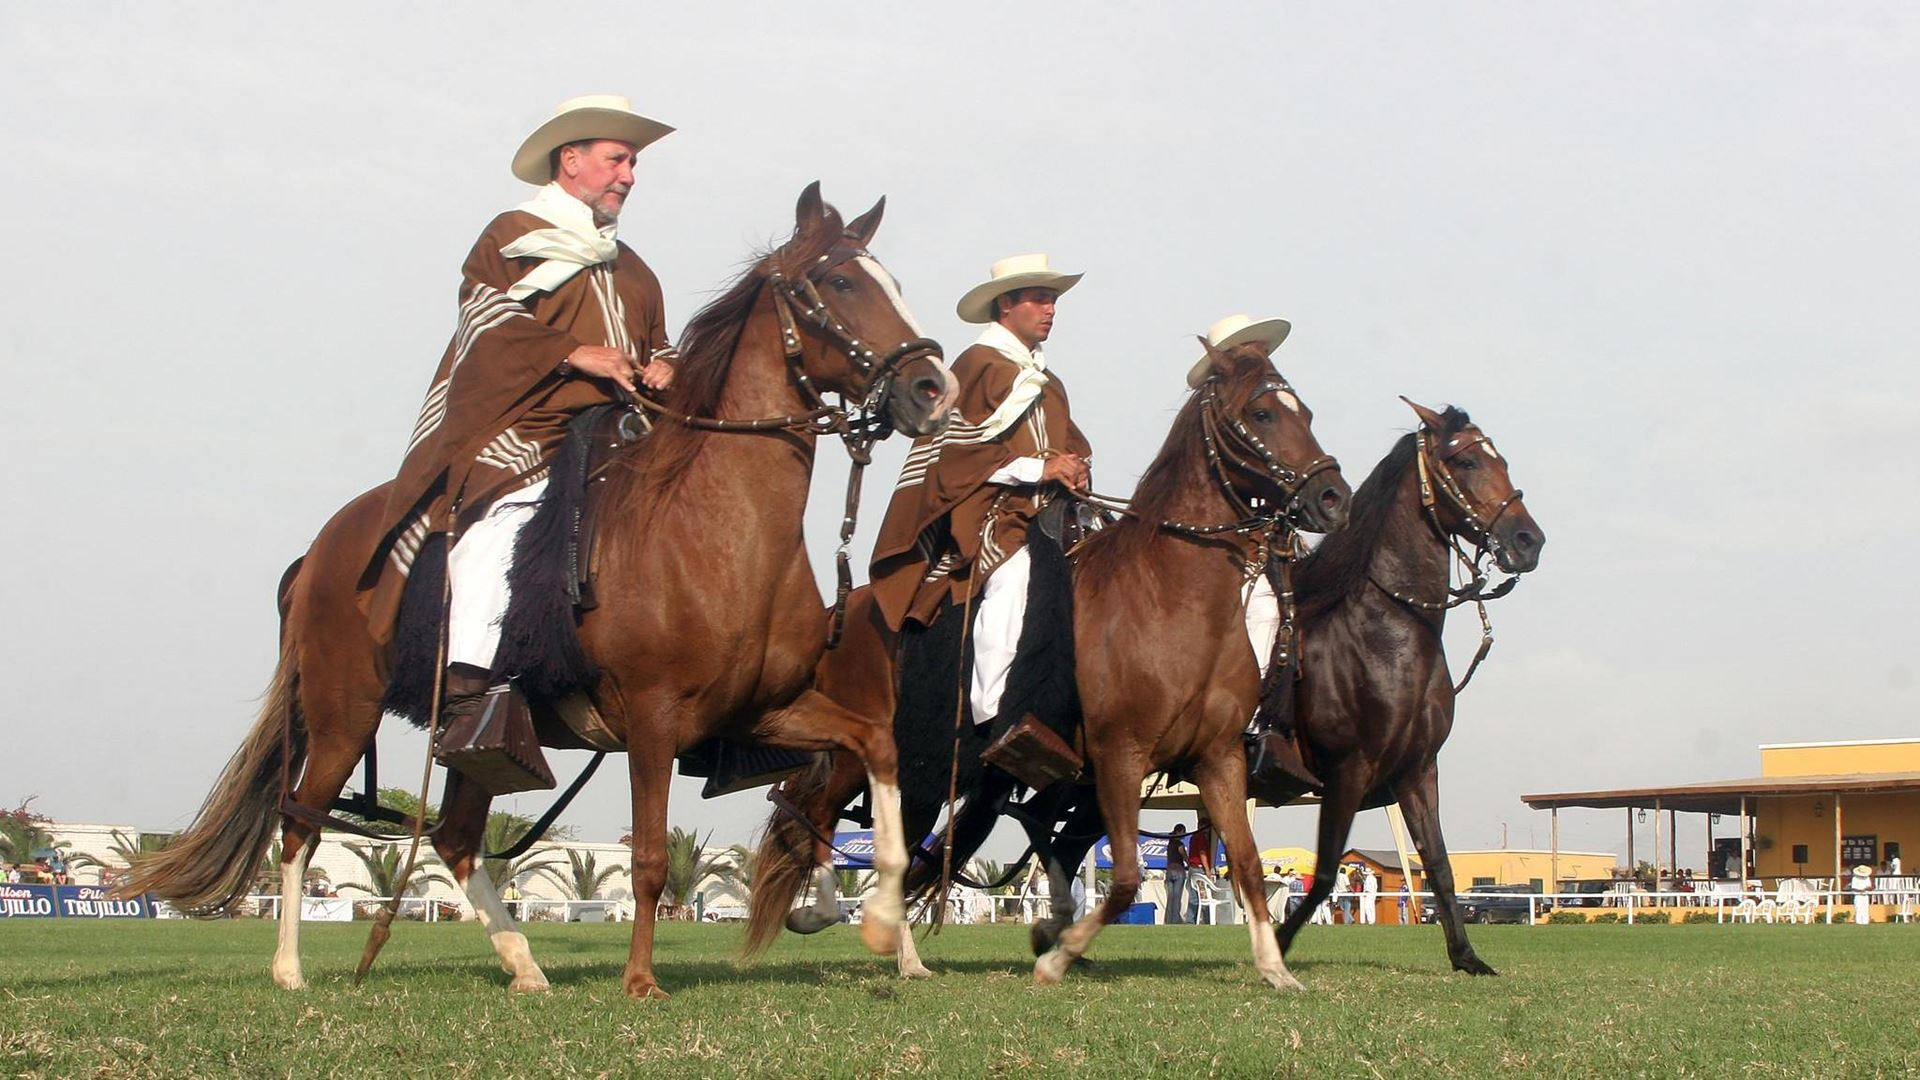 Peruvian Paso Horse & Marinera + Lunch